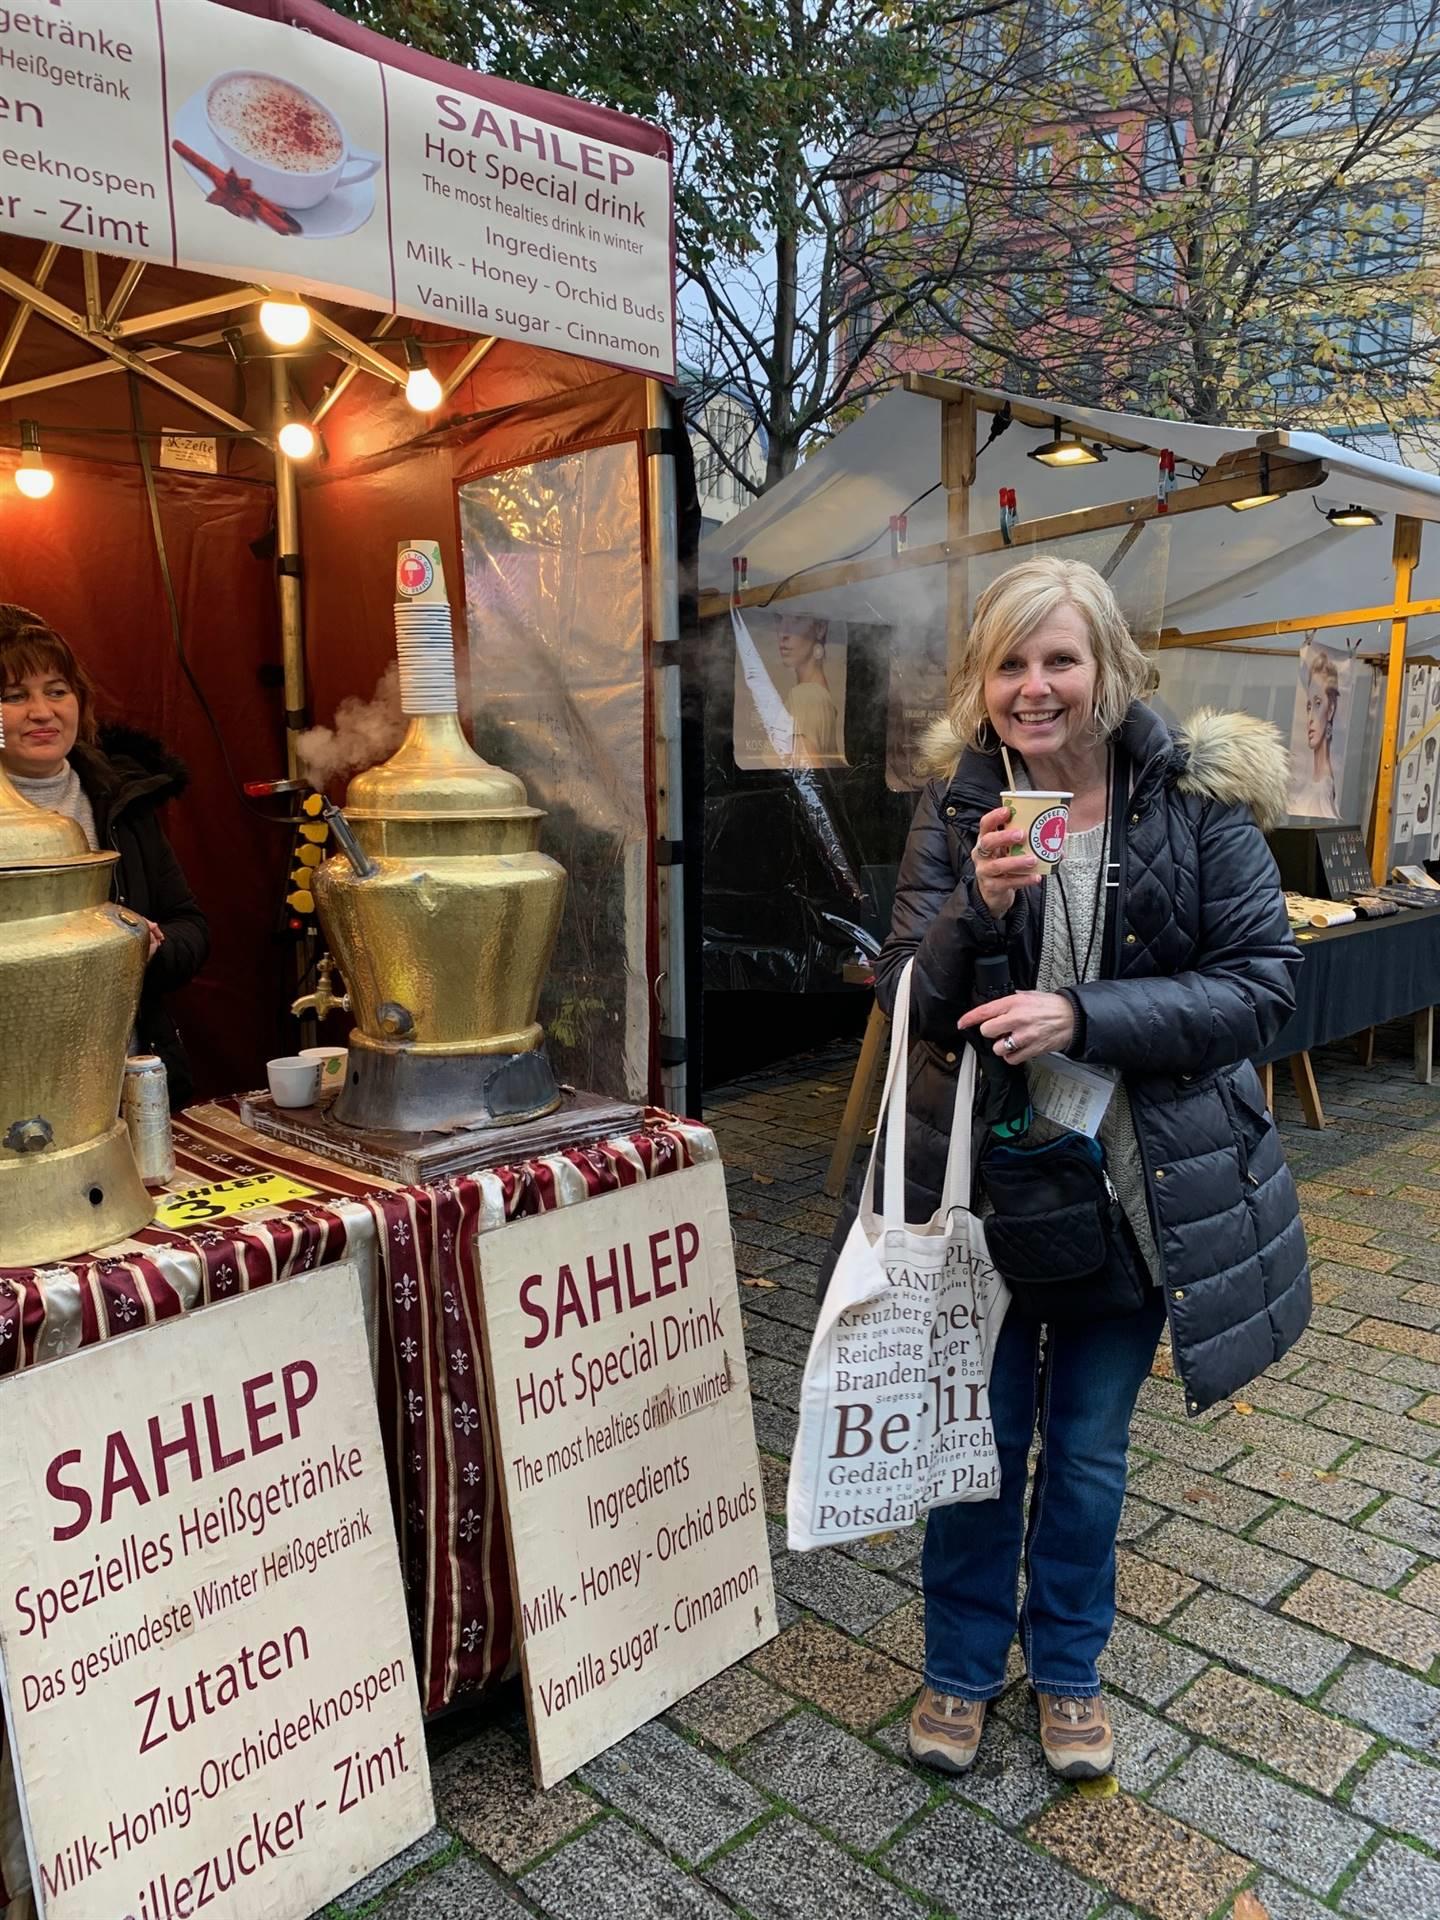 Mrs. Keaton in Berlin enjoying Sahlep (milk and honey)